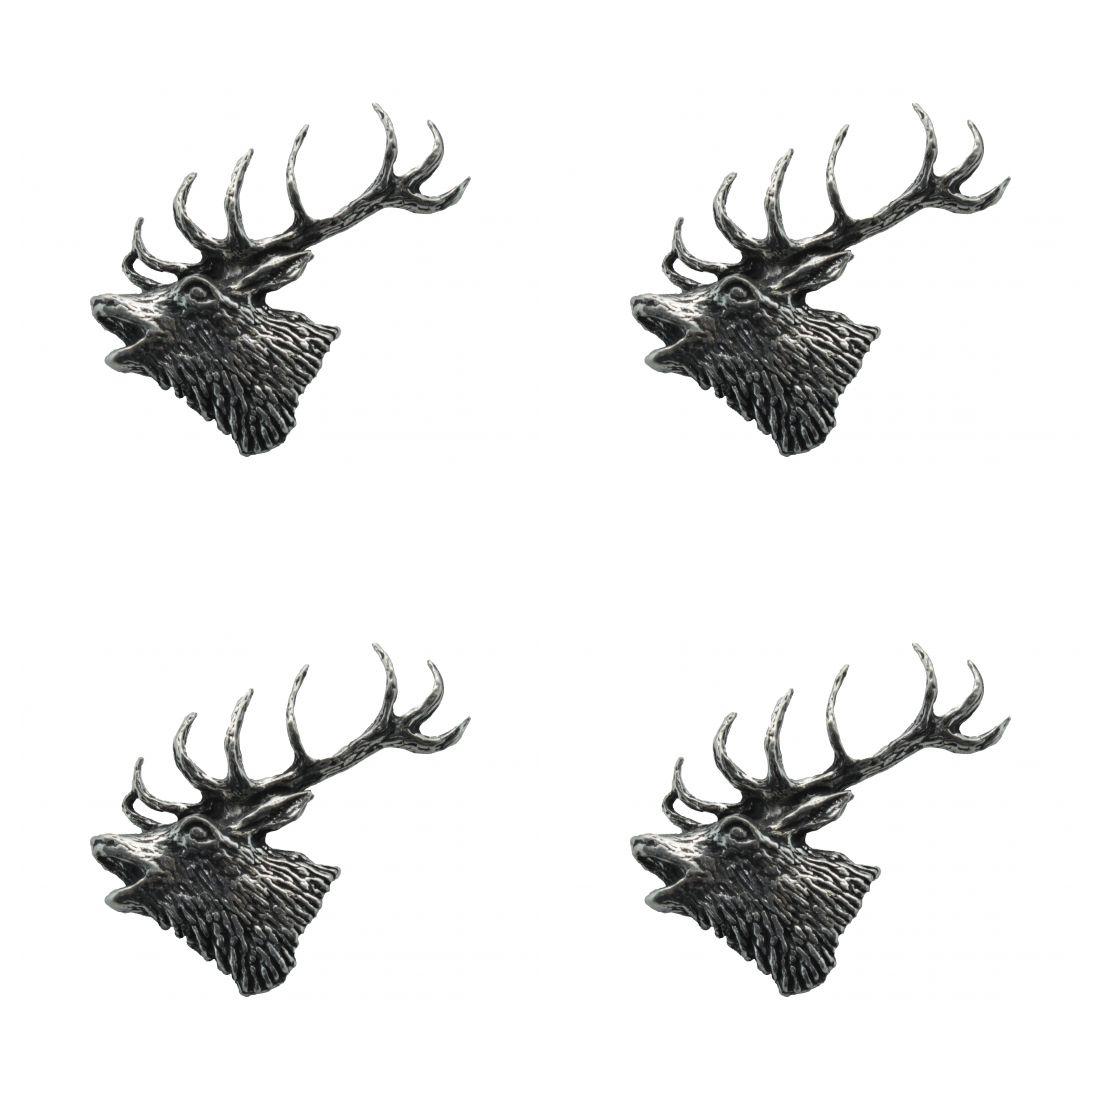 4x Pin Anstecker Badge Kopf Edelhirsch, 2,5x3,7cm